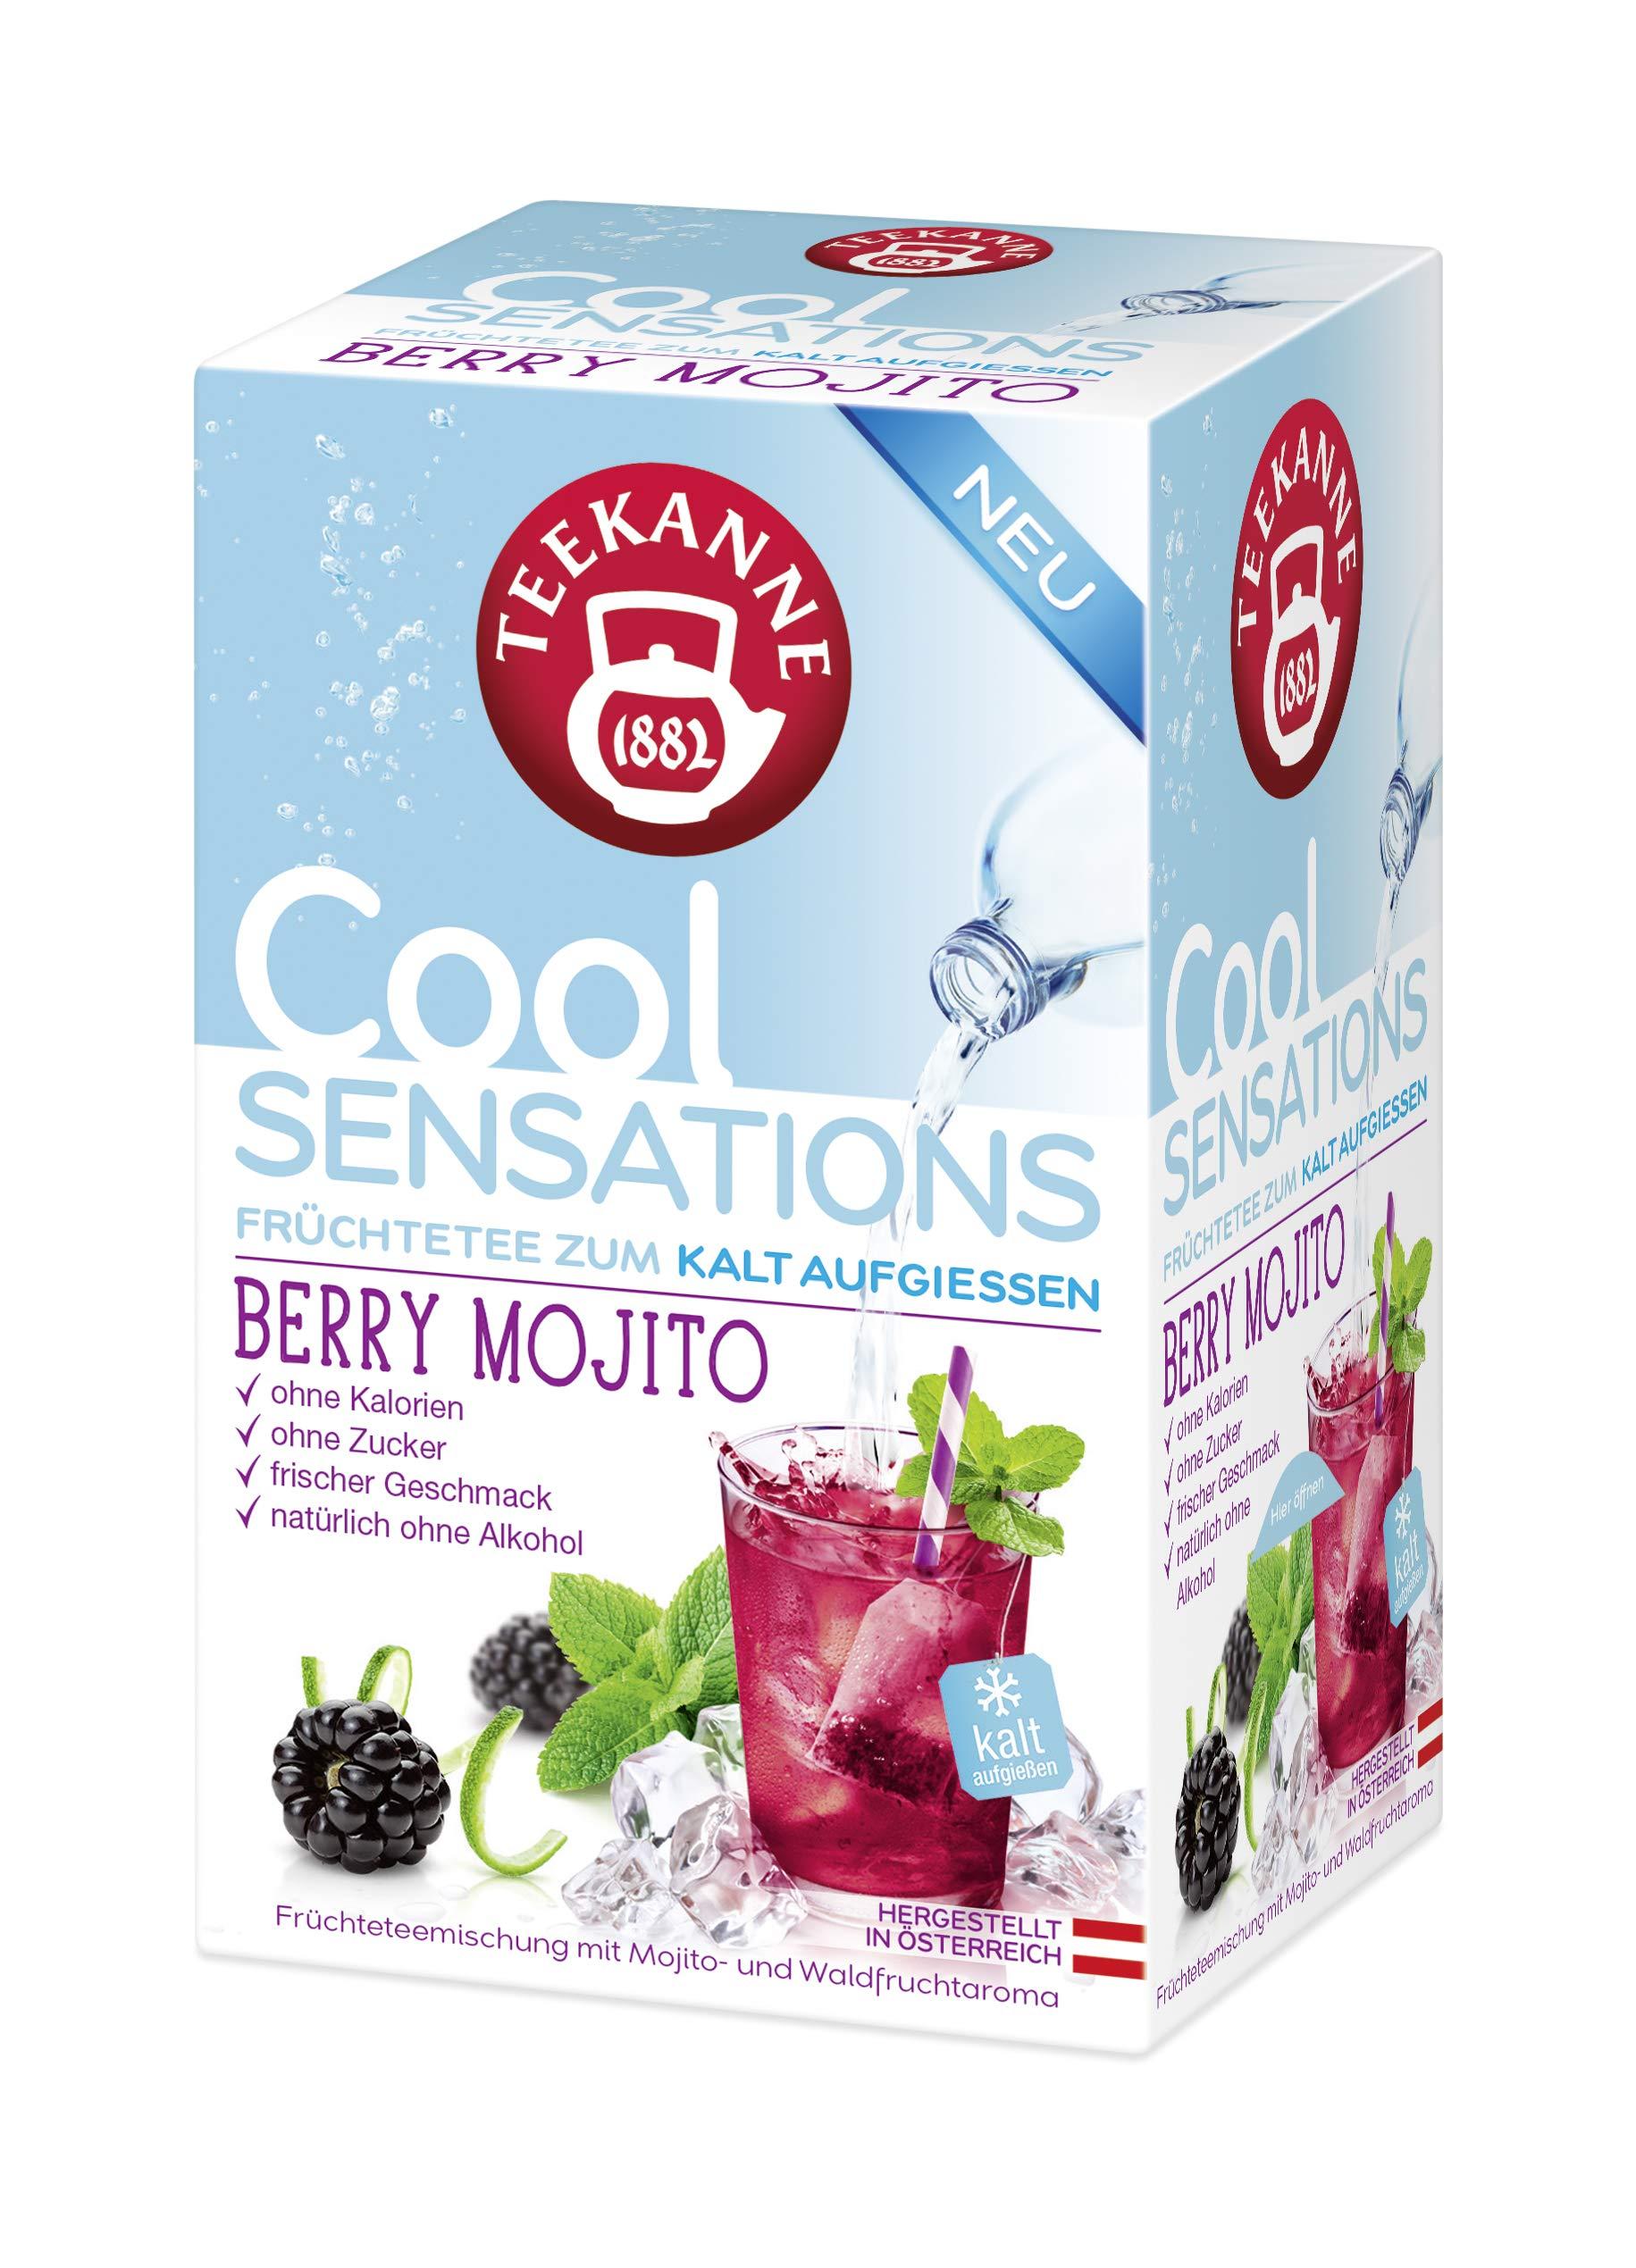 Teekanne-sterreich-Cool-Sensations-Berry-Mojito-5er-Pack-5-x-940-g